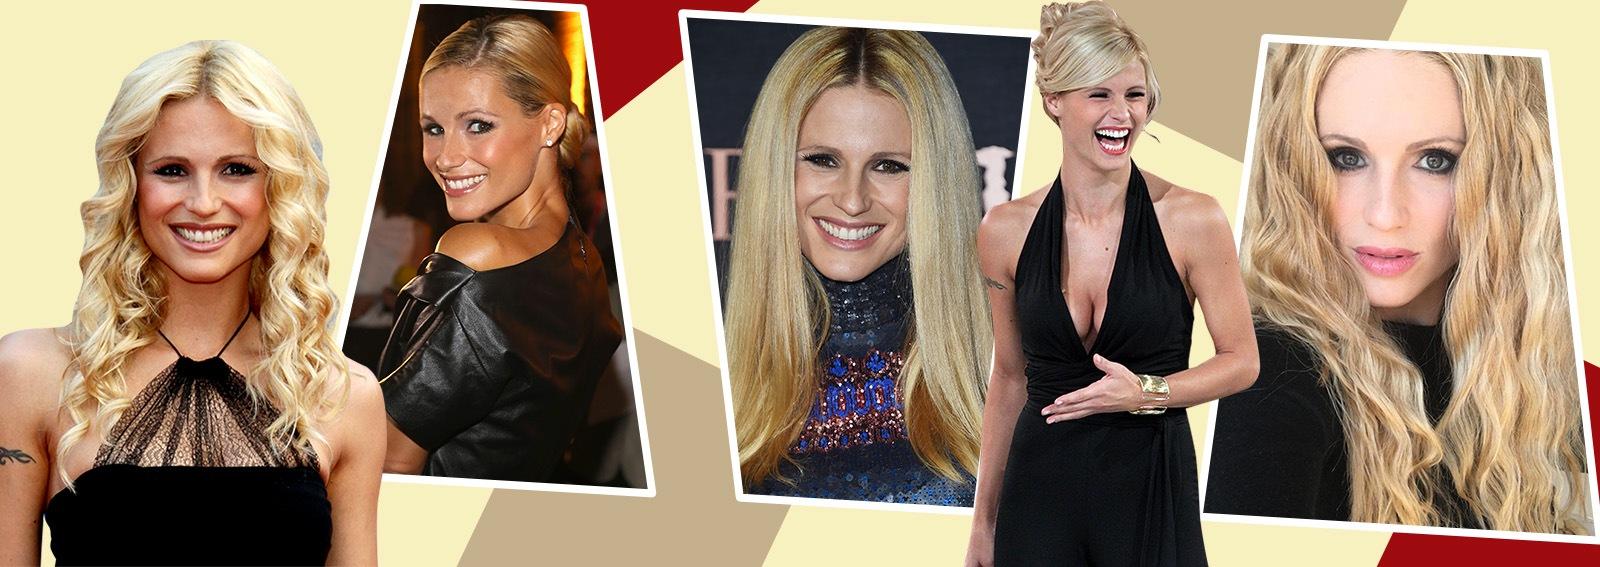 michelle hunziker colore capelli trucco e i beauty look piu belli collage_desktop